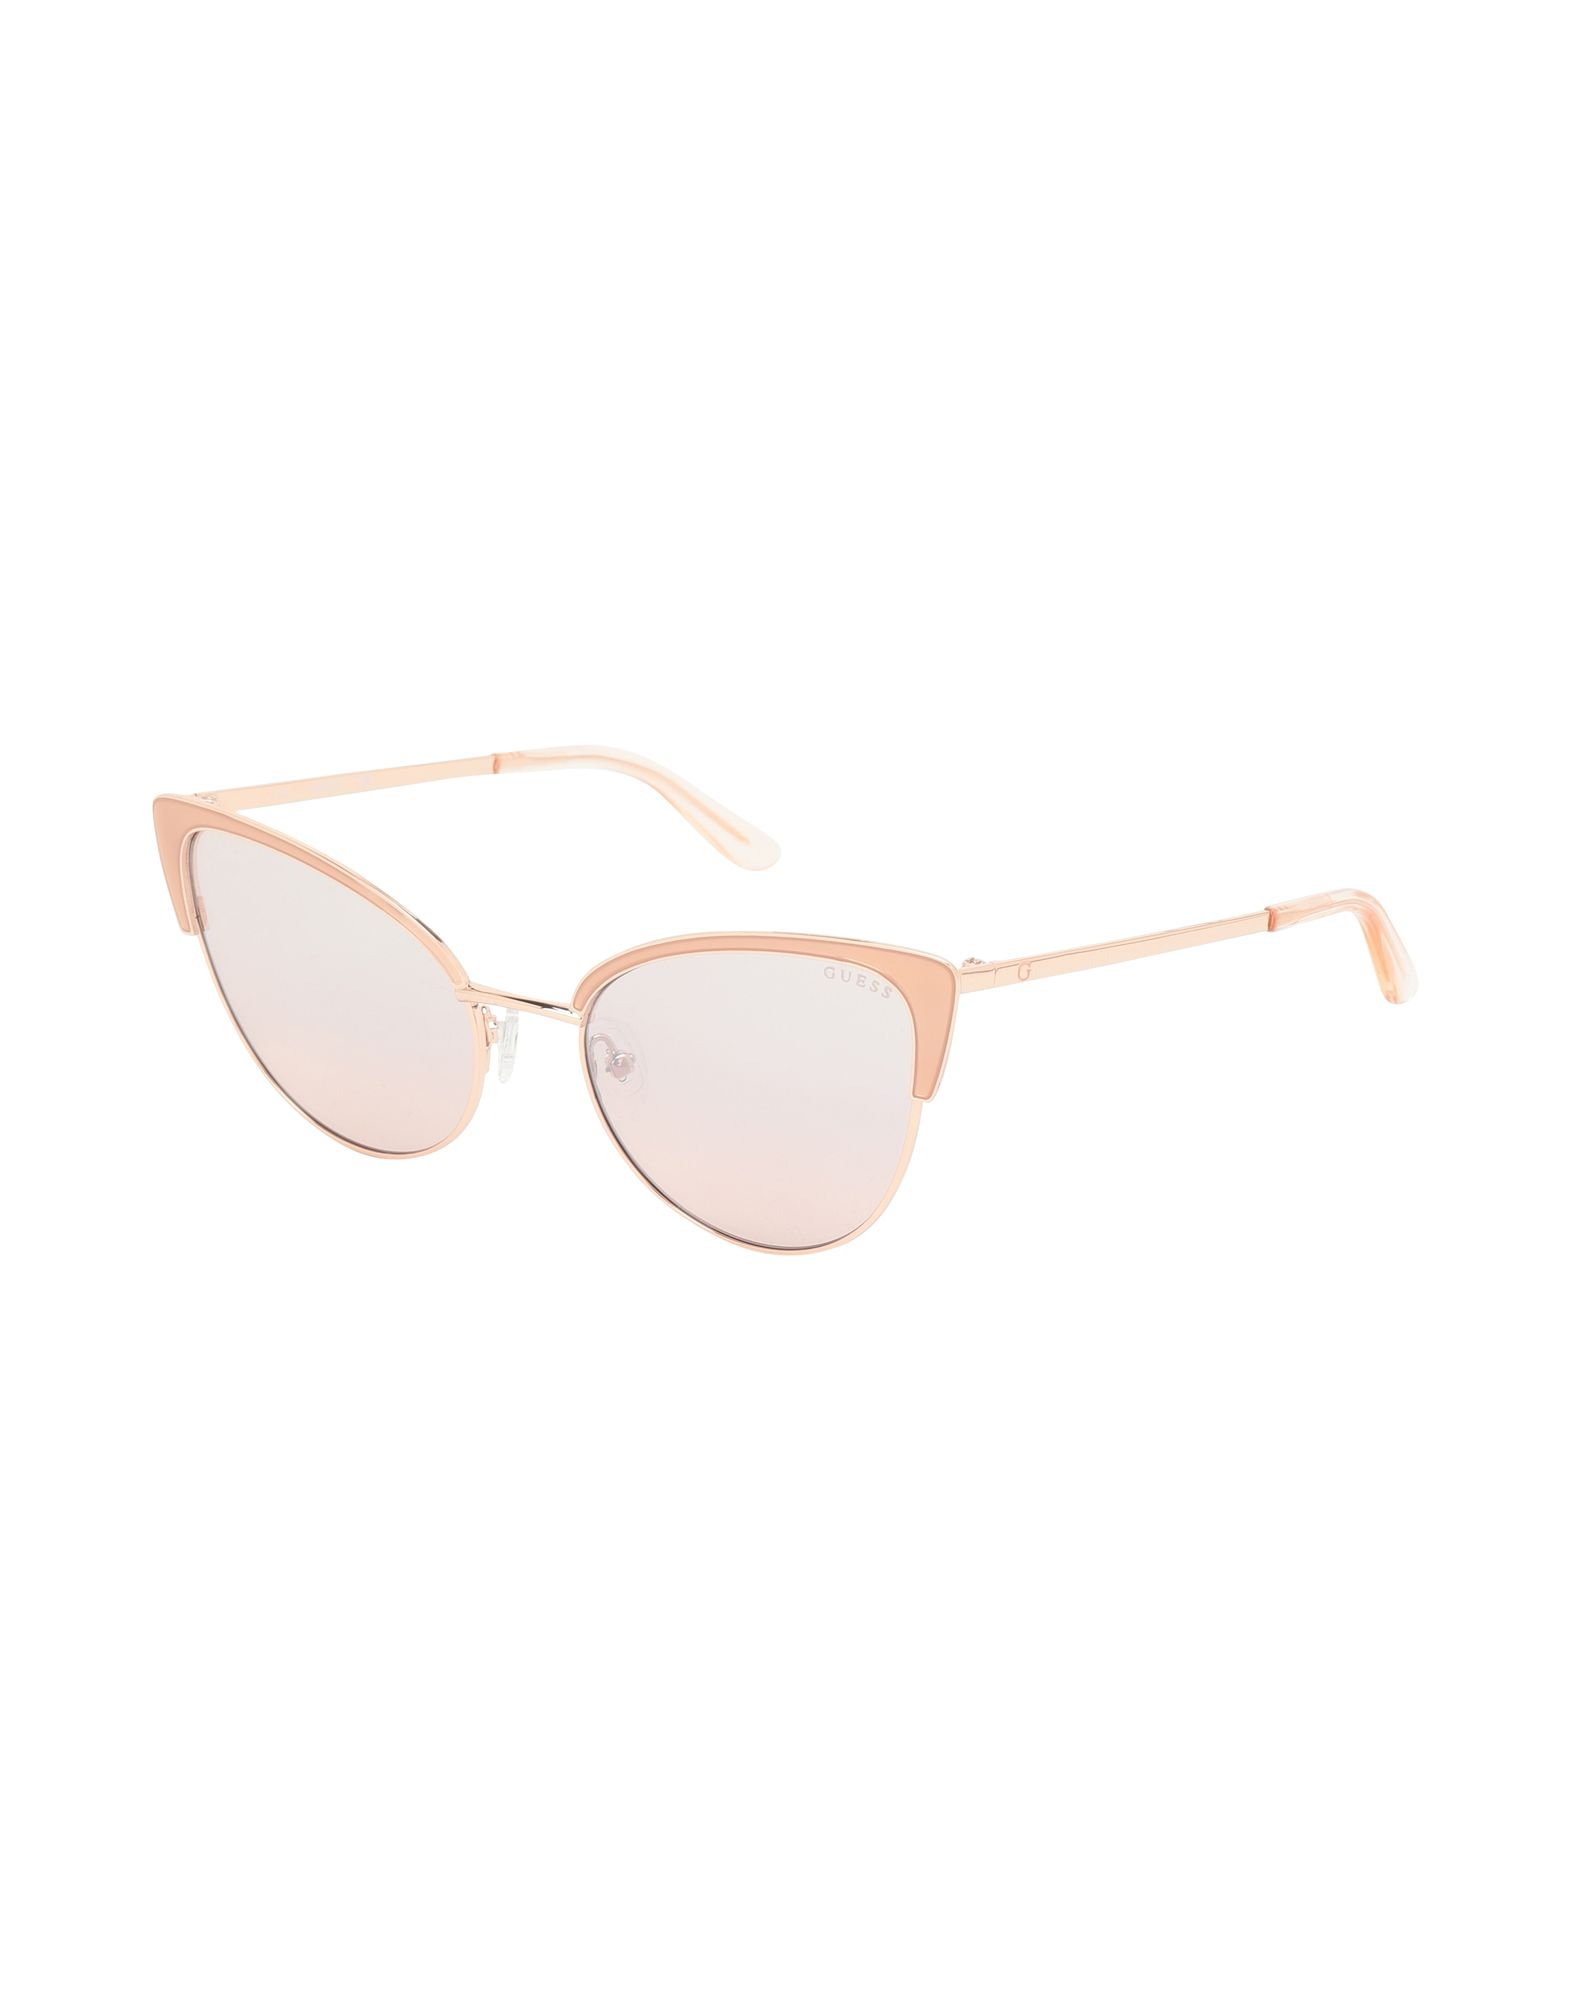 Фото - GUESS Солнечные очки 3d очки